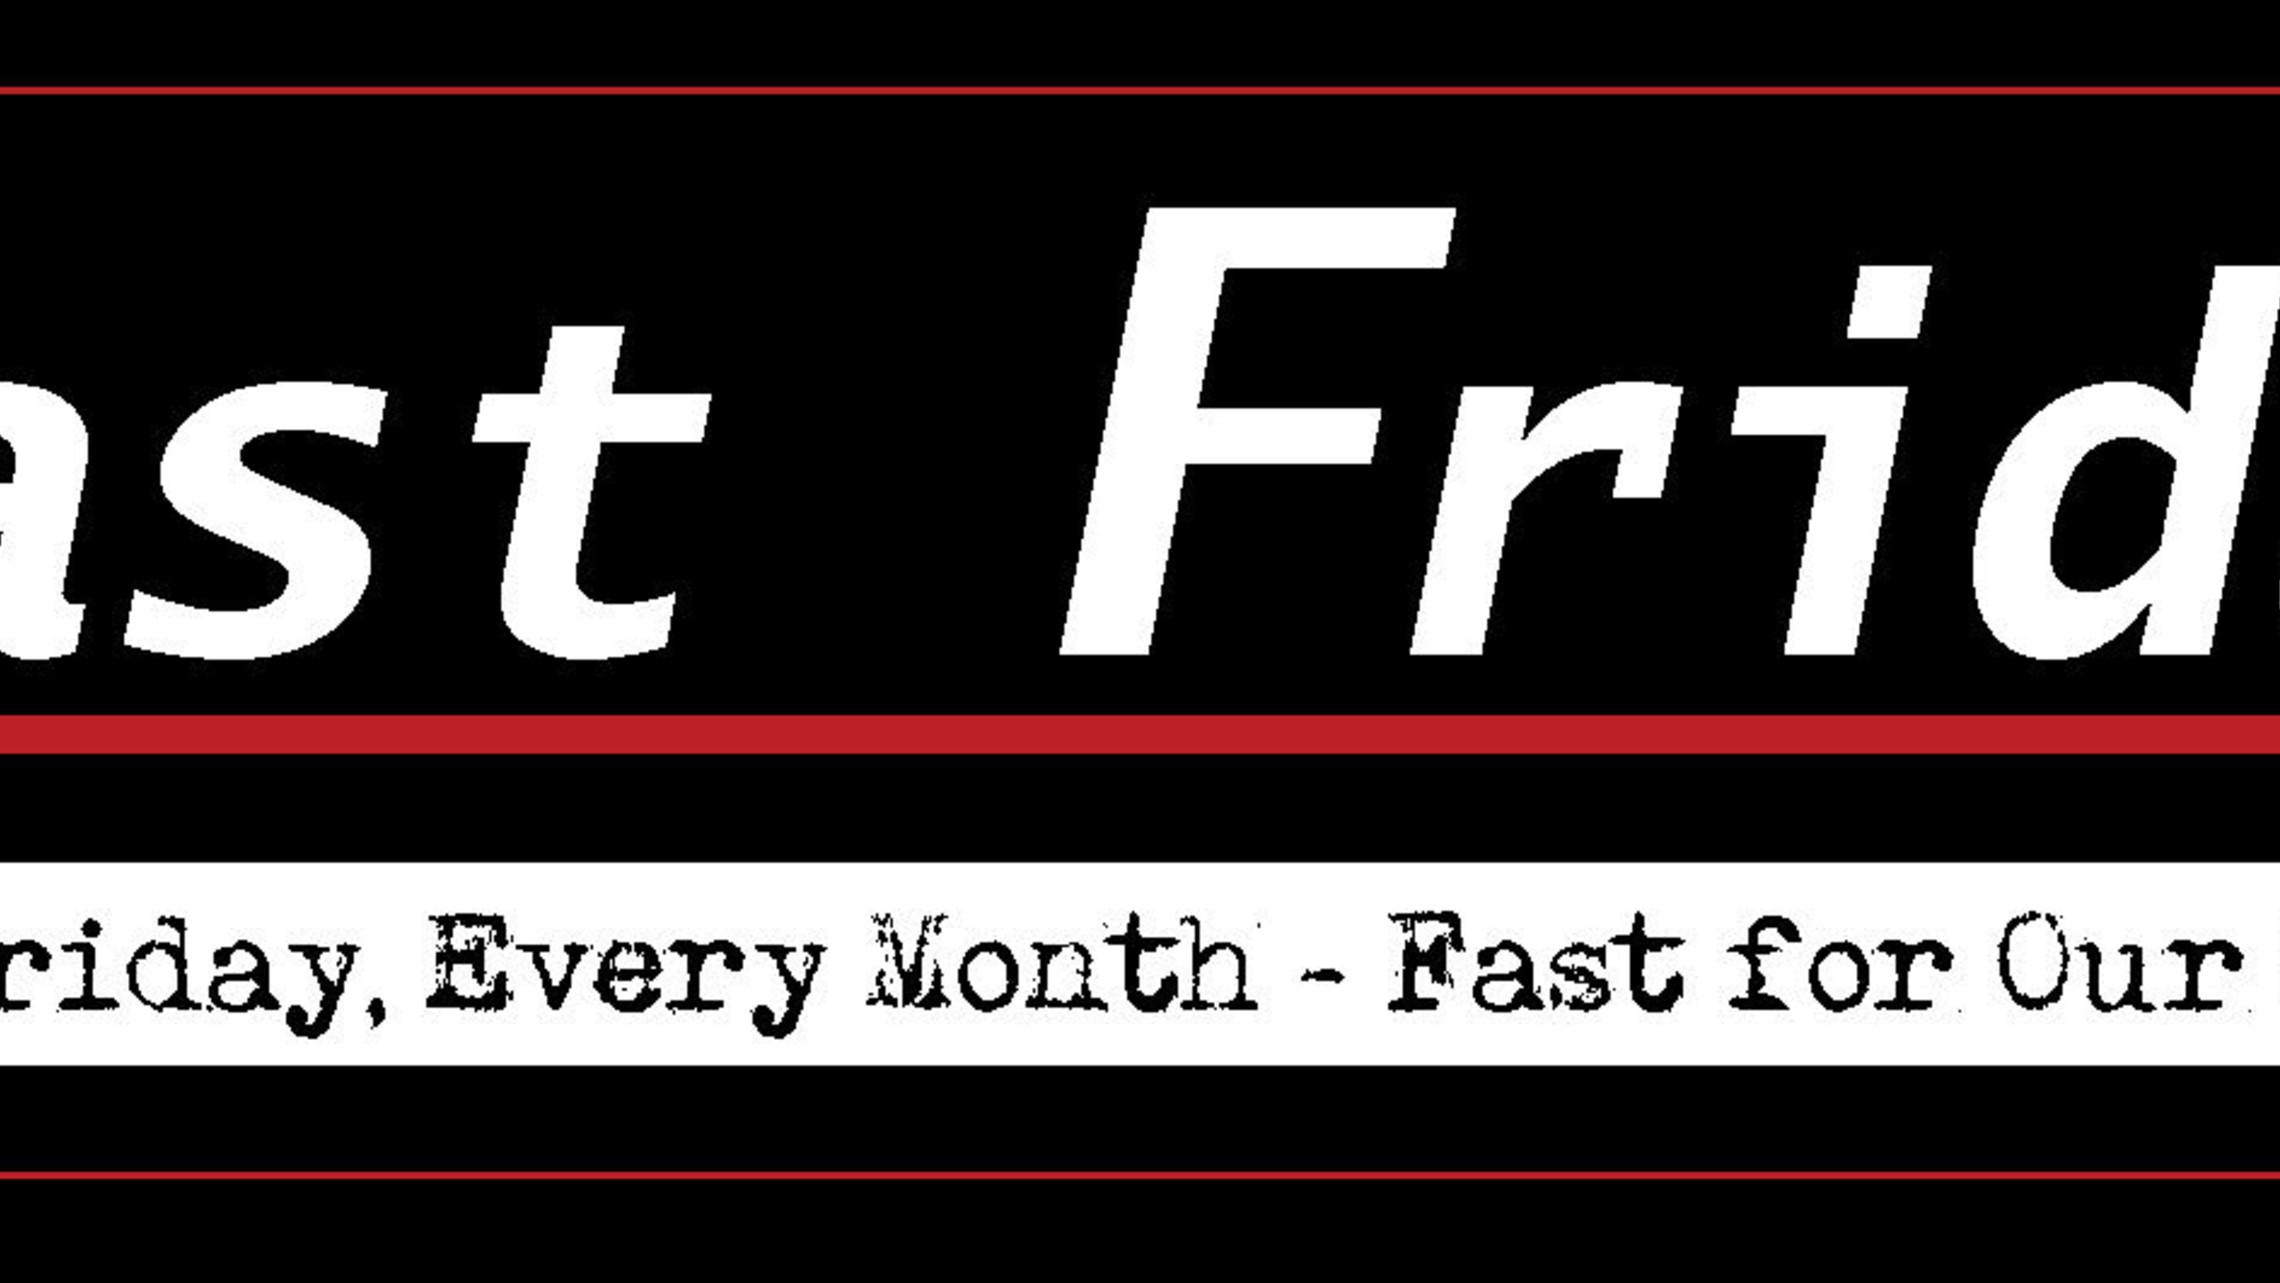 Fast Friday 1667 X 531